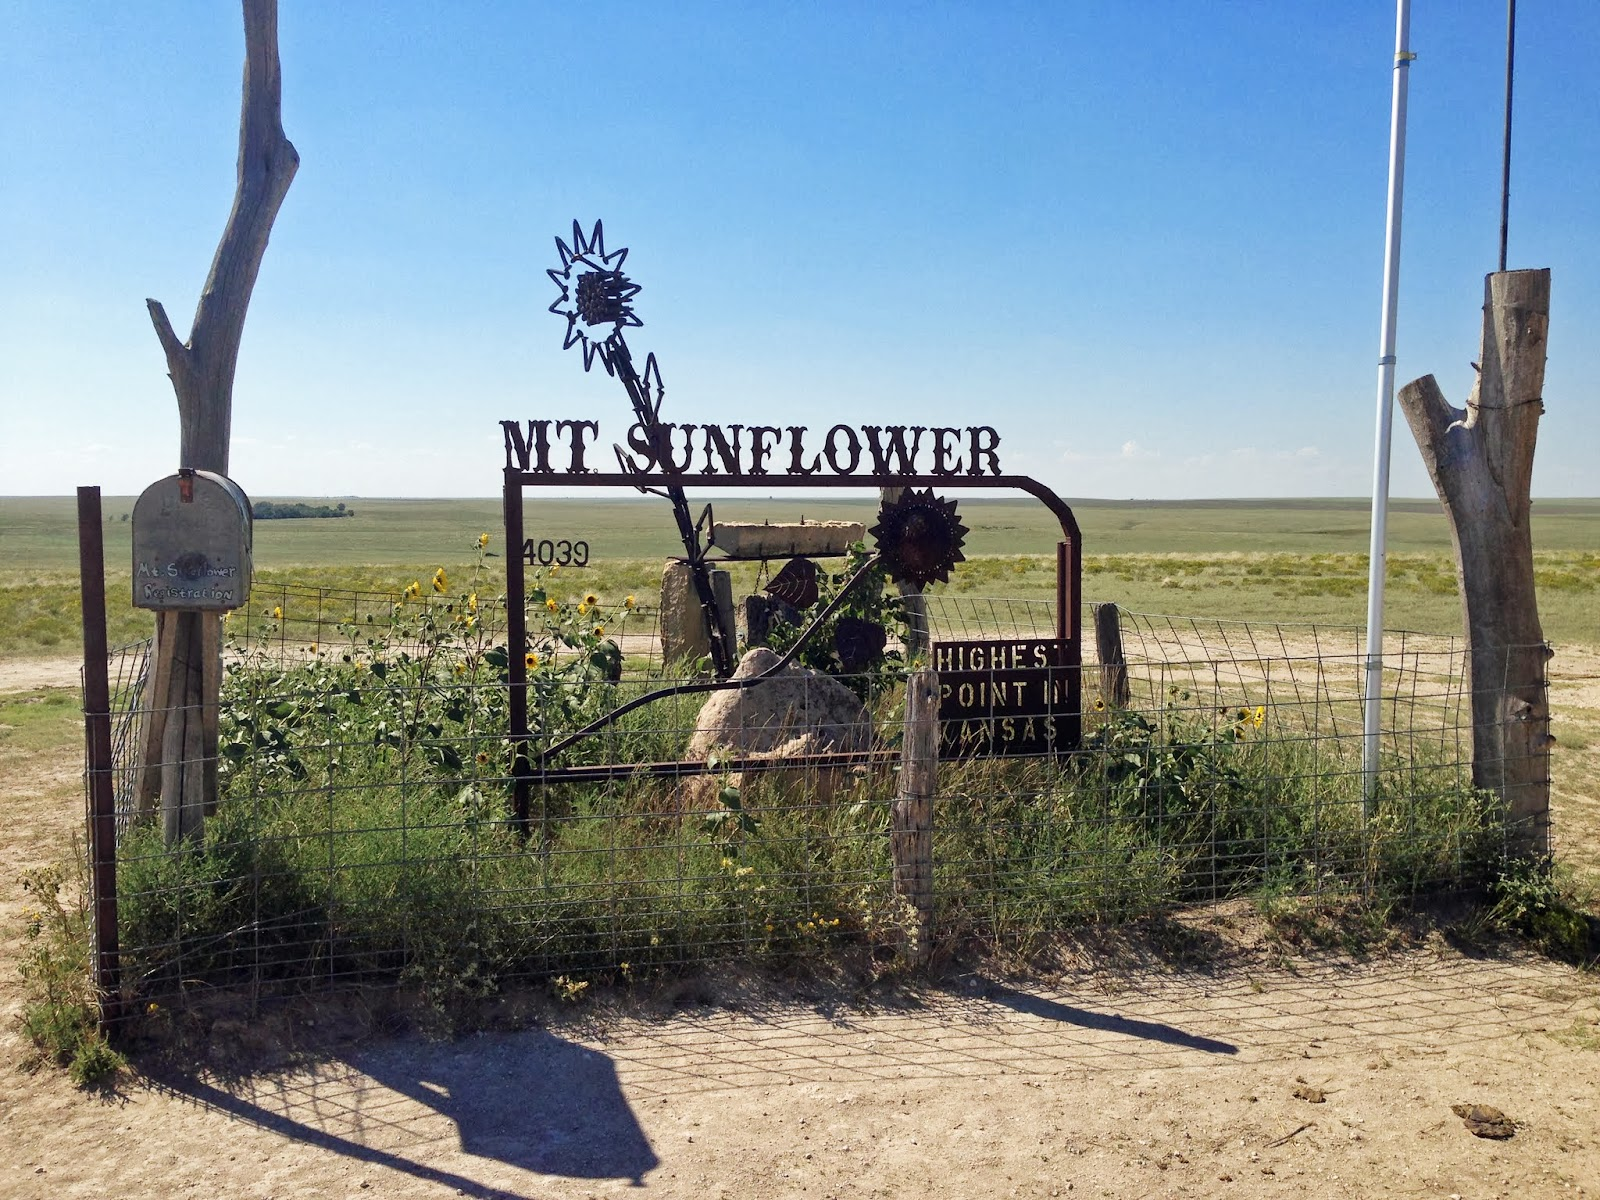 Close to Home Mount Sunflower - Climber.Org Trip Report